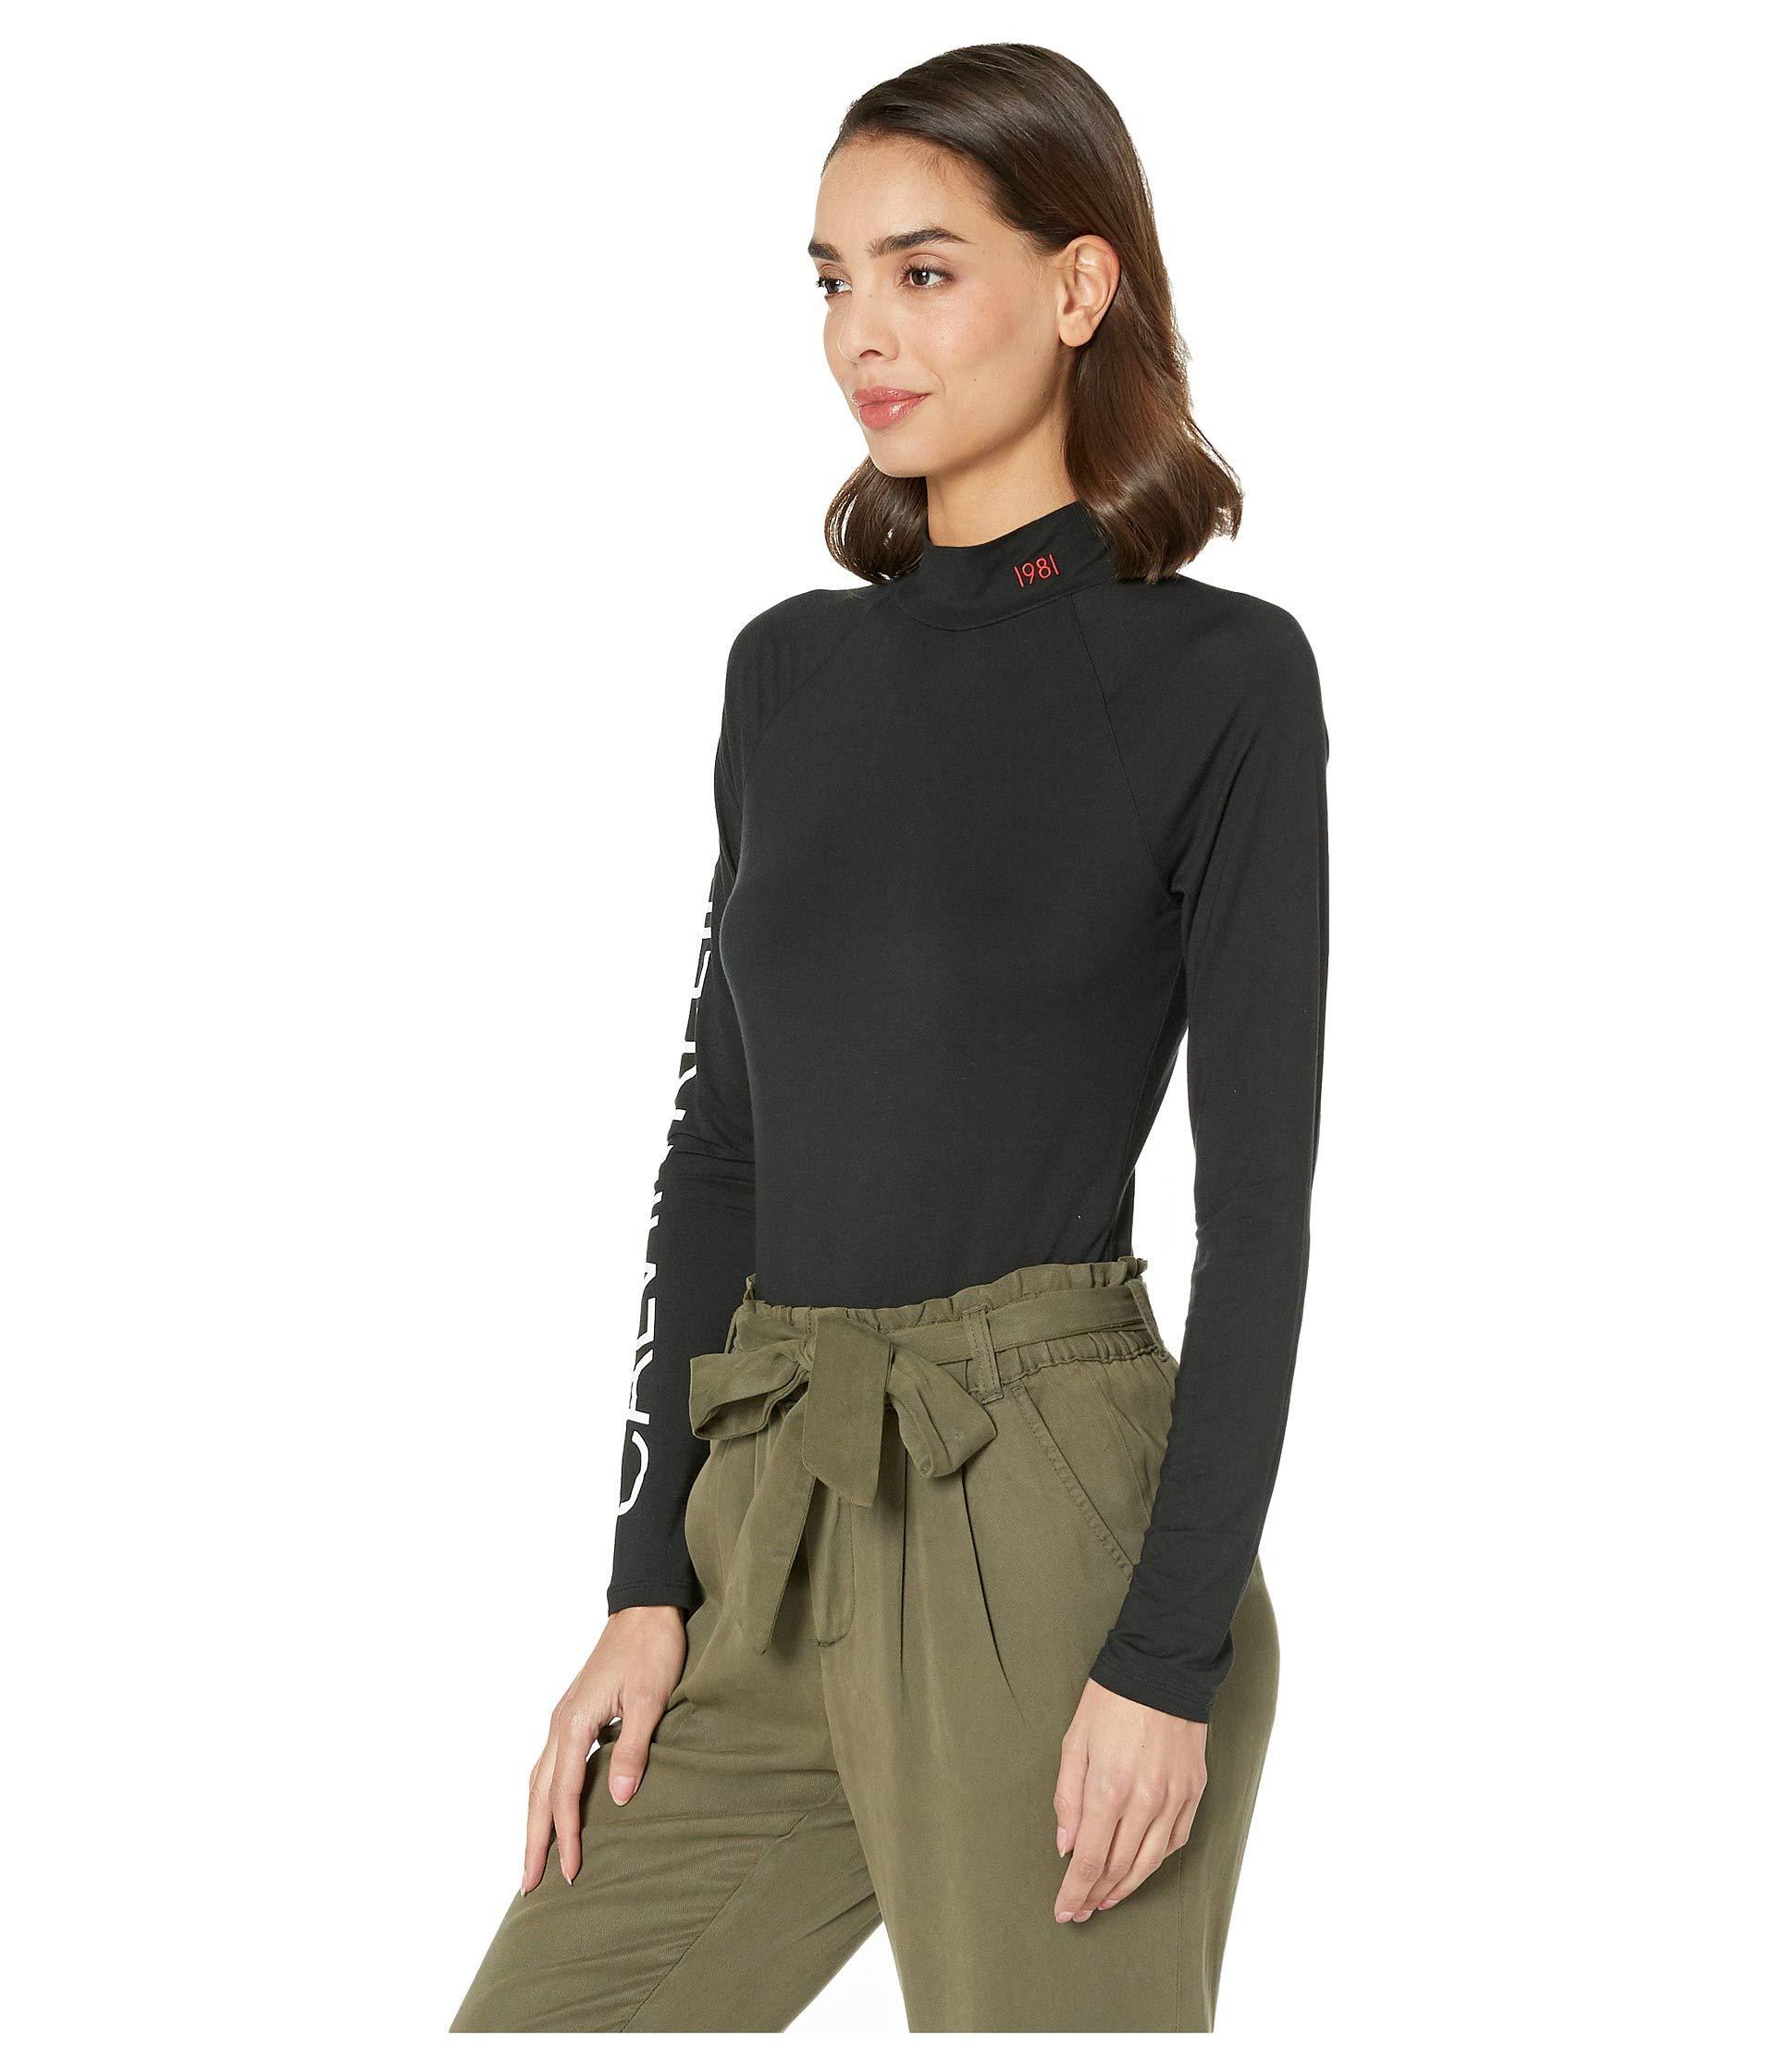 Lyst - Calvin Klein Statement Lounge Bodysuit (black) Women s Jumpsuit   Rompers  One Piece in Black 11375c69b